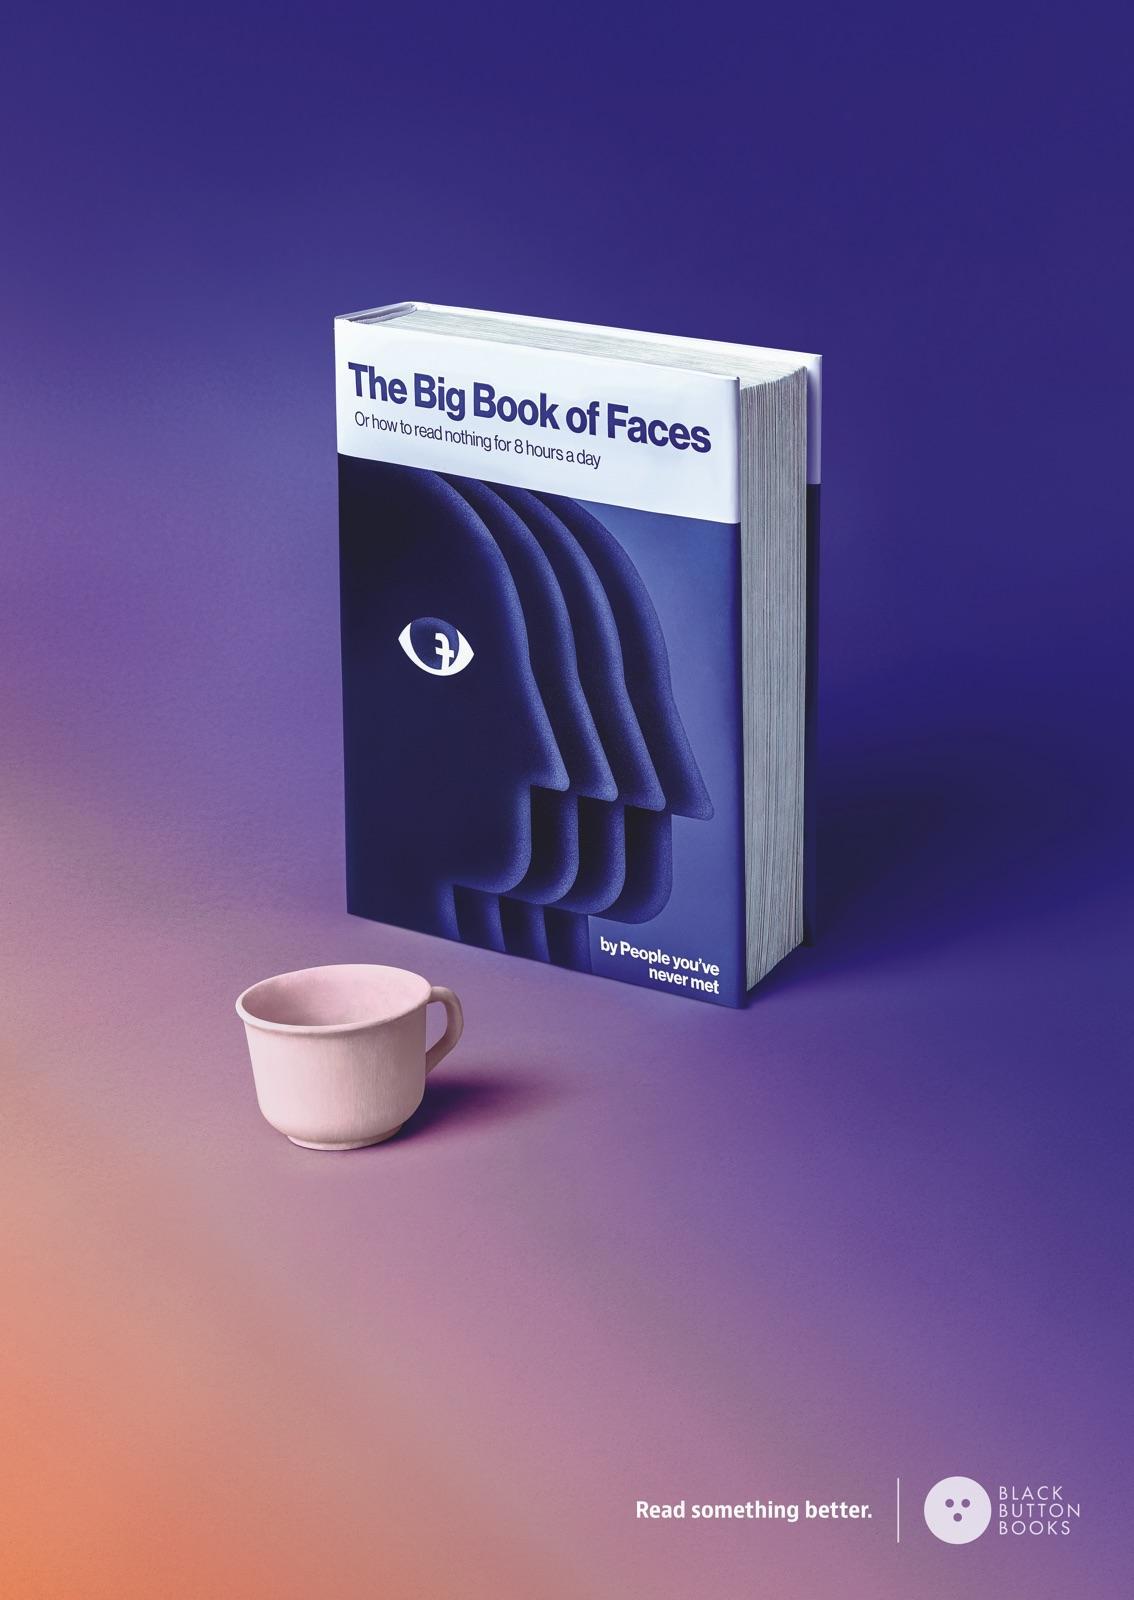 Black Button Books Print Ad - Big Book of Faces